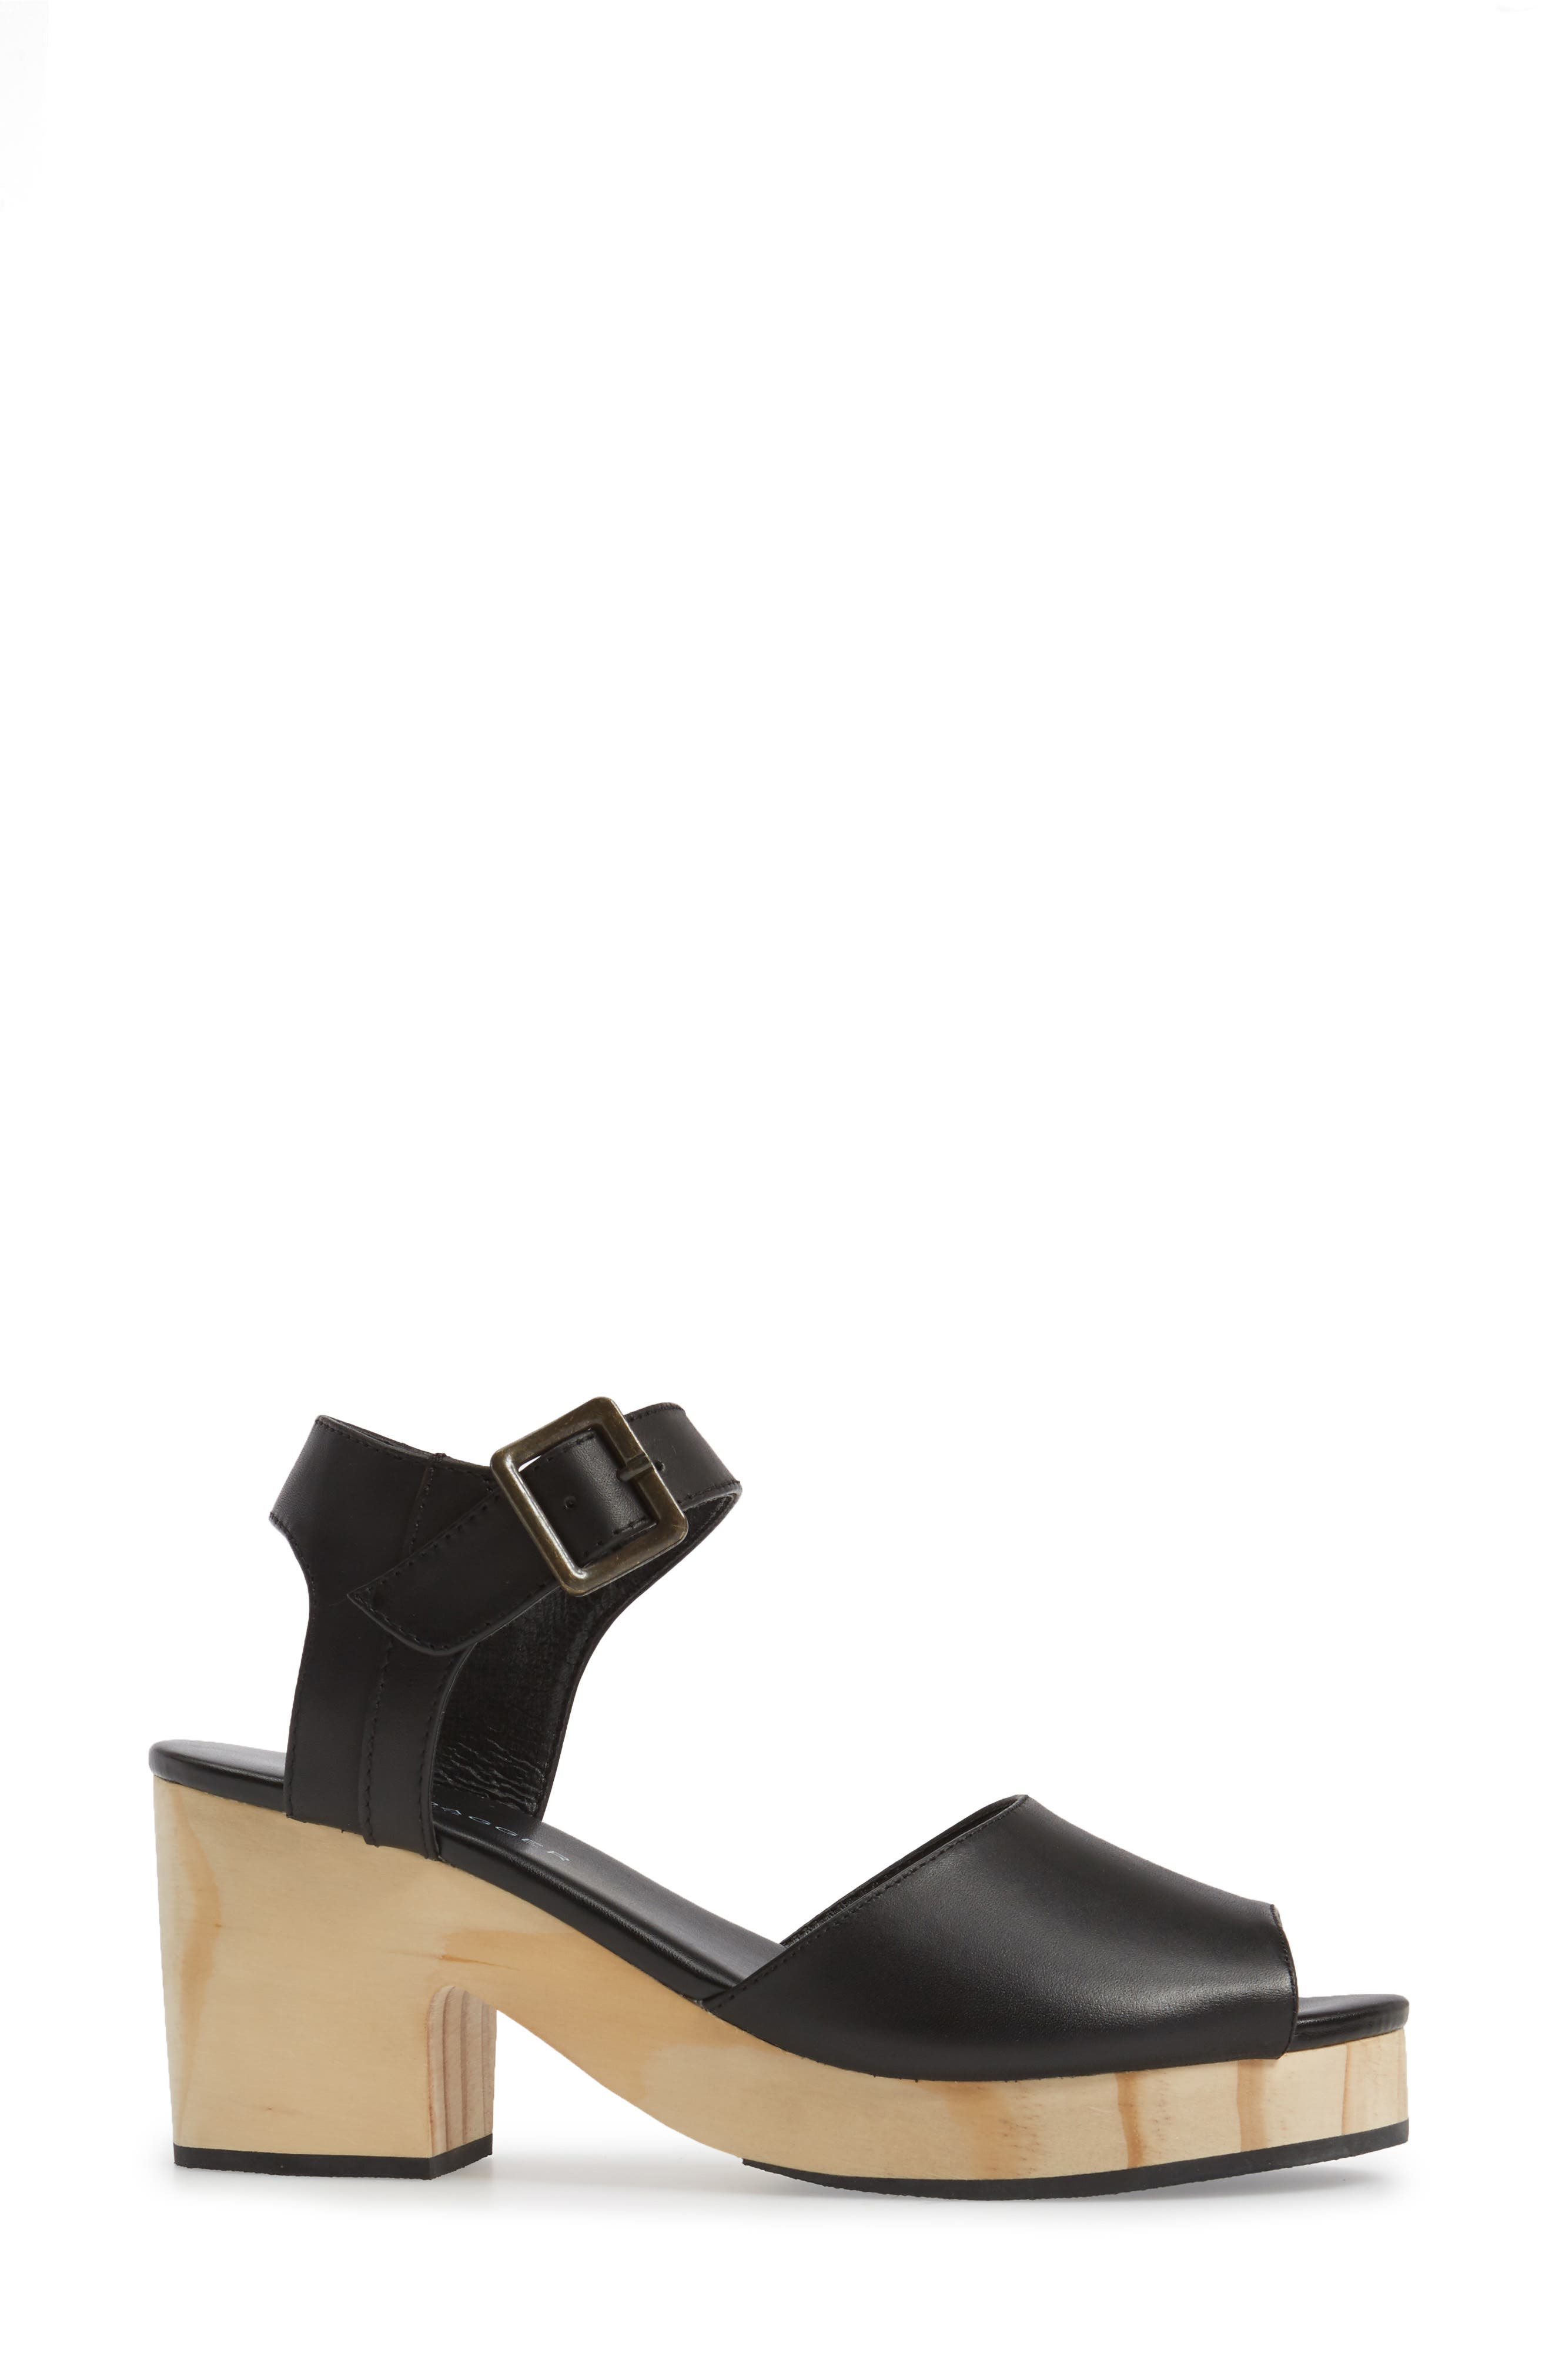 Montgomery Platform Sandal,                             Alternate thumbnail 3, color,                             Black Leather